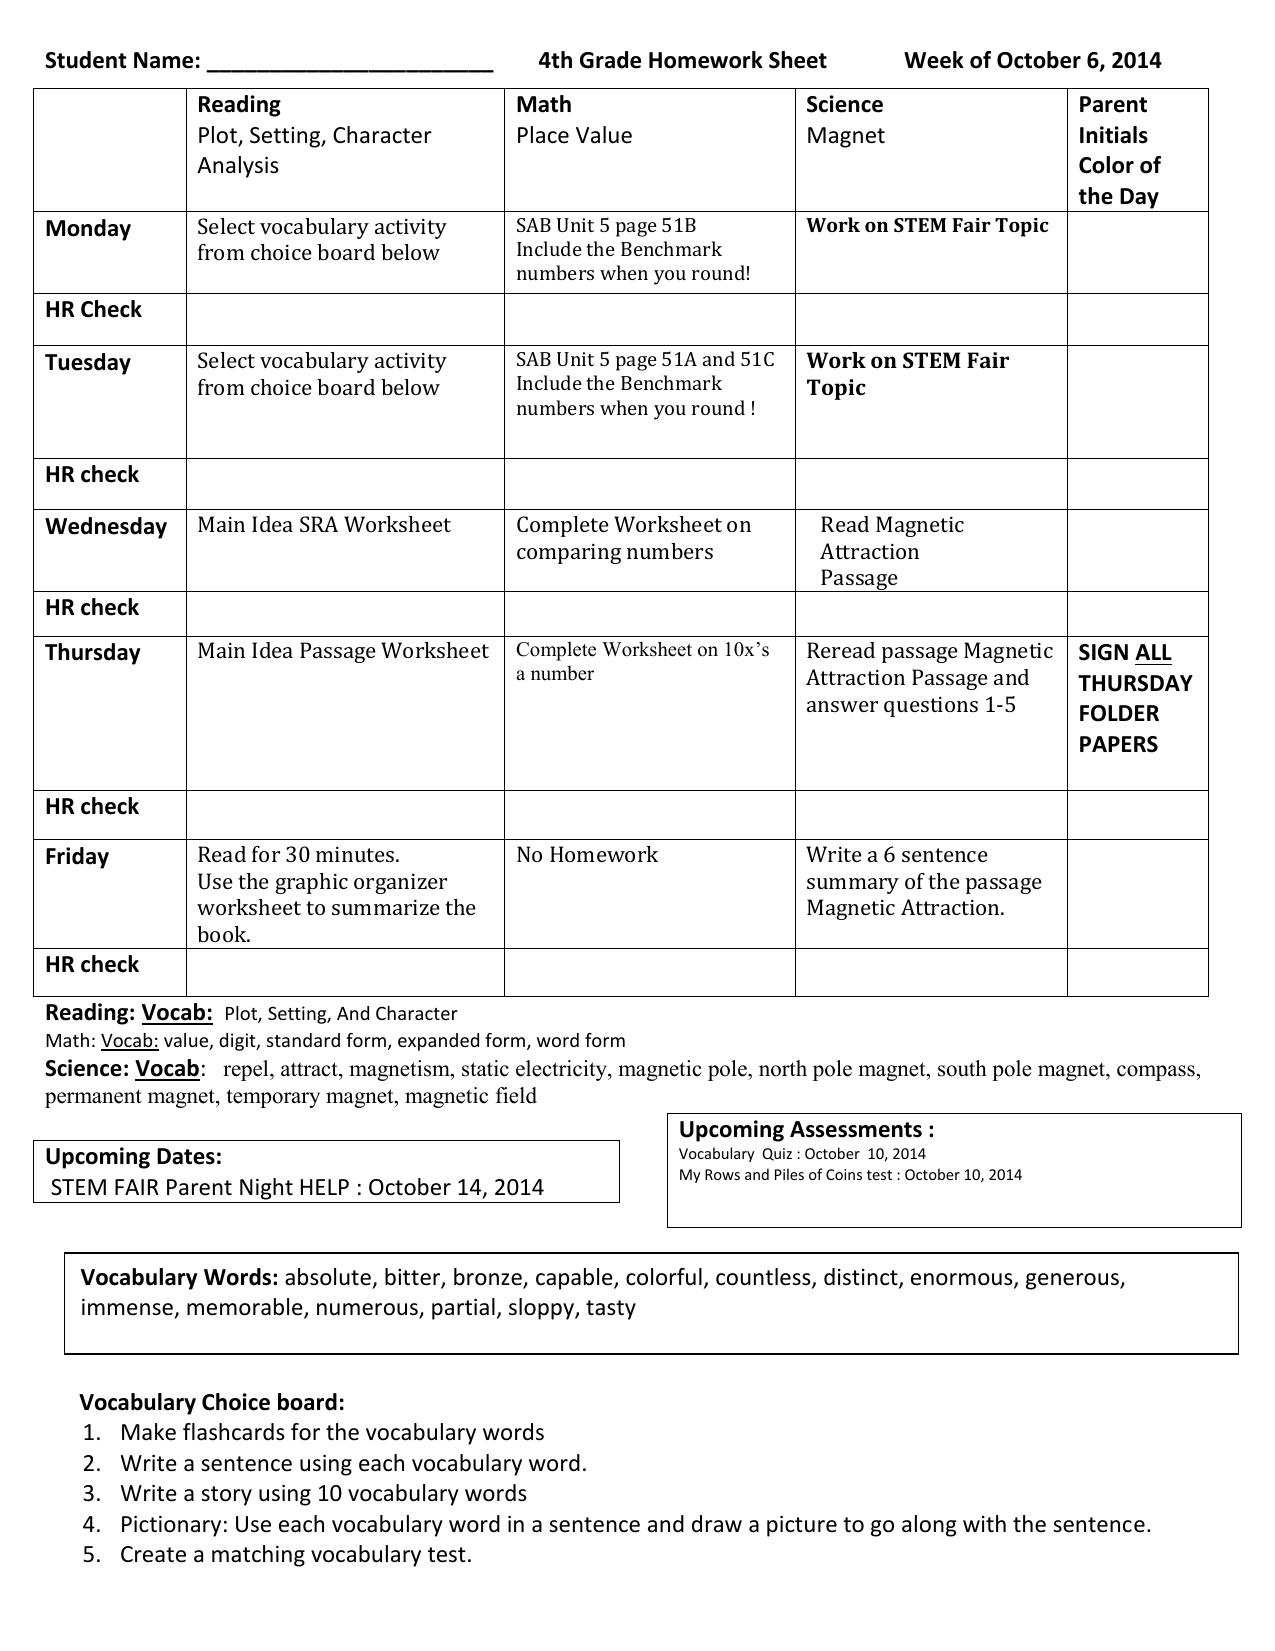 Student Name 4th Grade Homework Sheet Week Of October 6